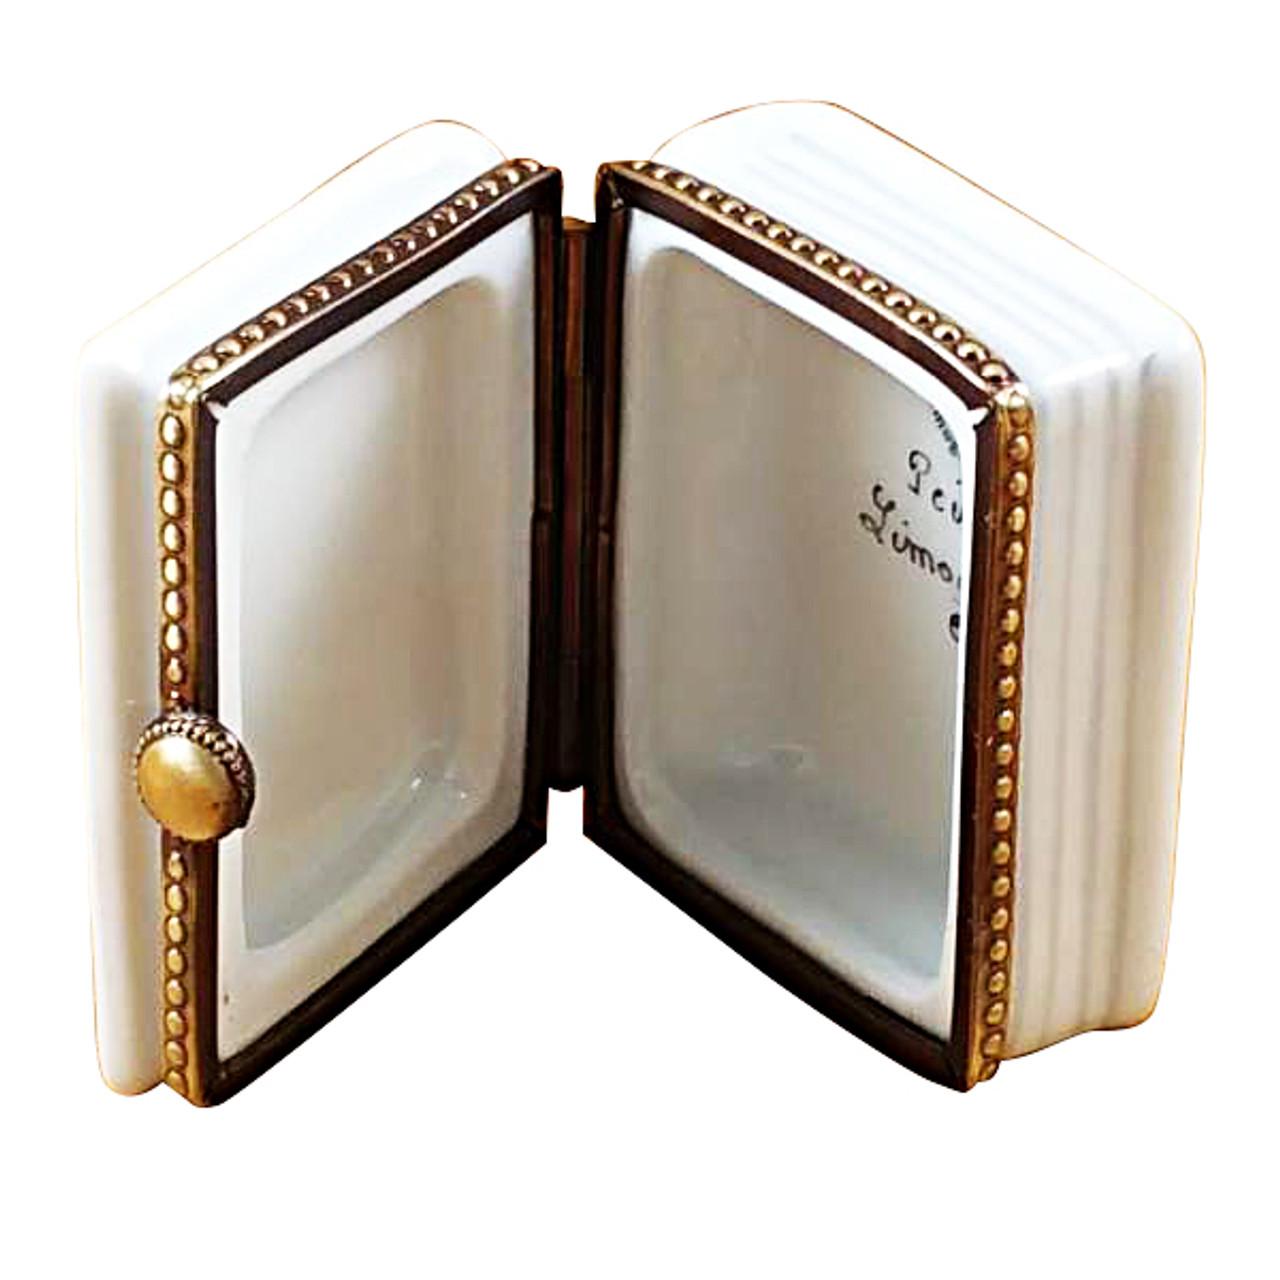 Book Le Petite Prince Rochard Limoges Box